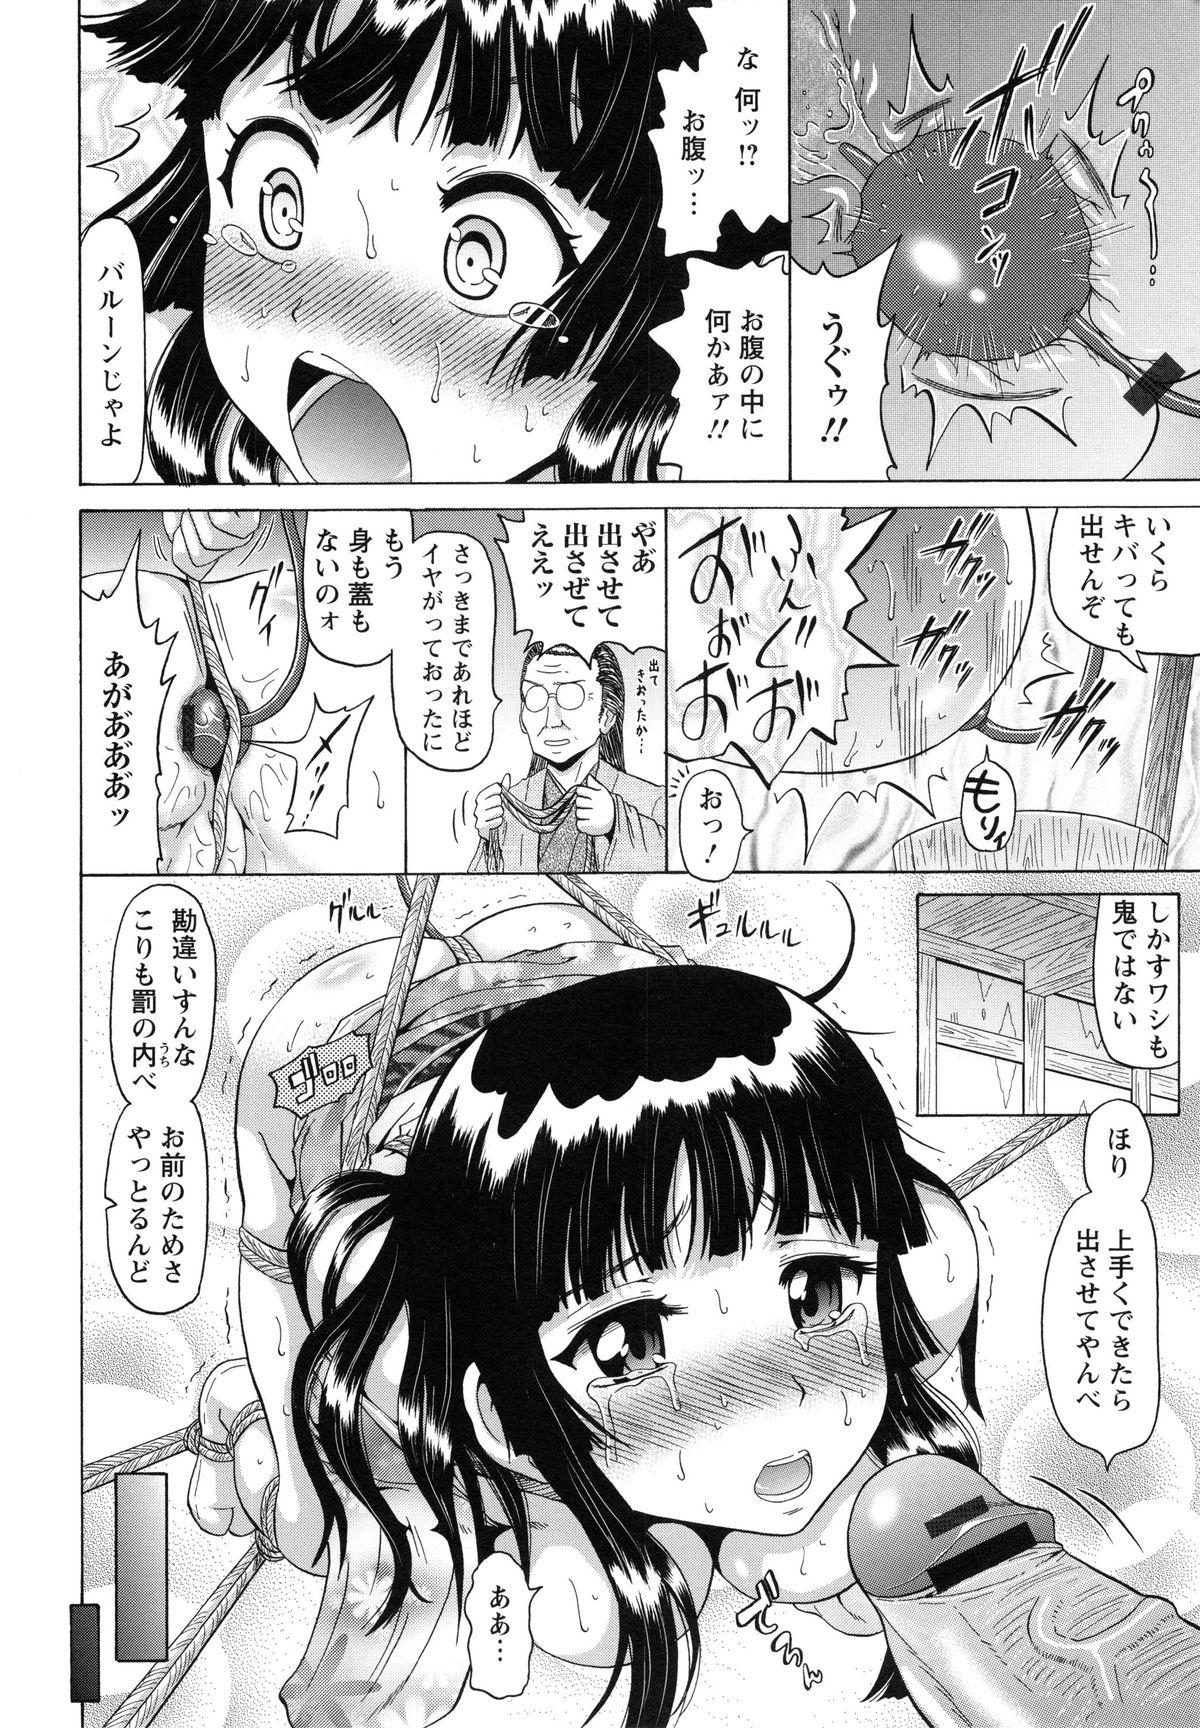 [Nukunuku Orange] Seikou ~Maeana Kanzen Houchi~ - Keep Anus in Anguish!!!! 57